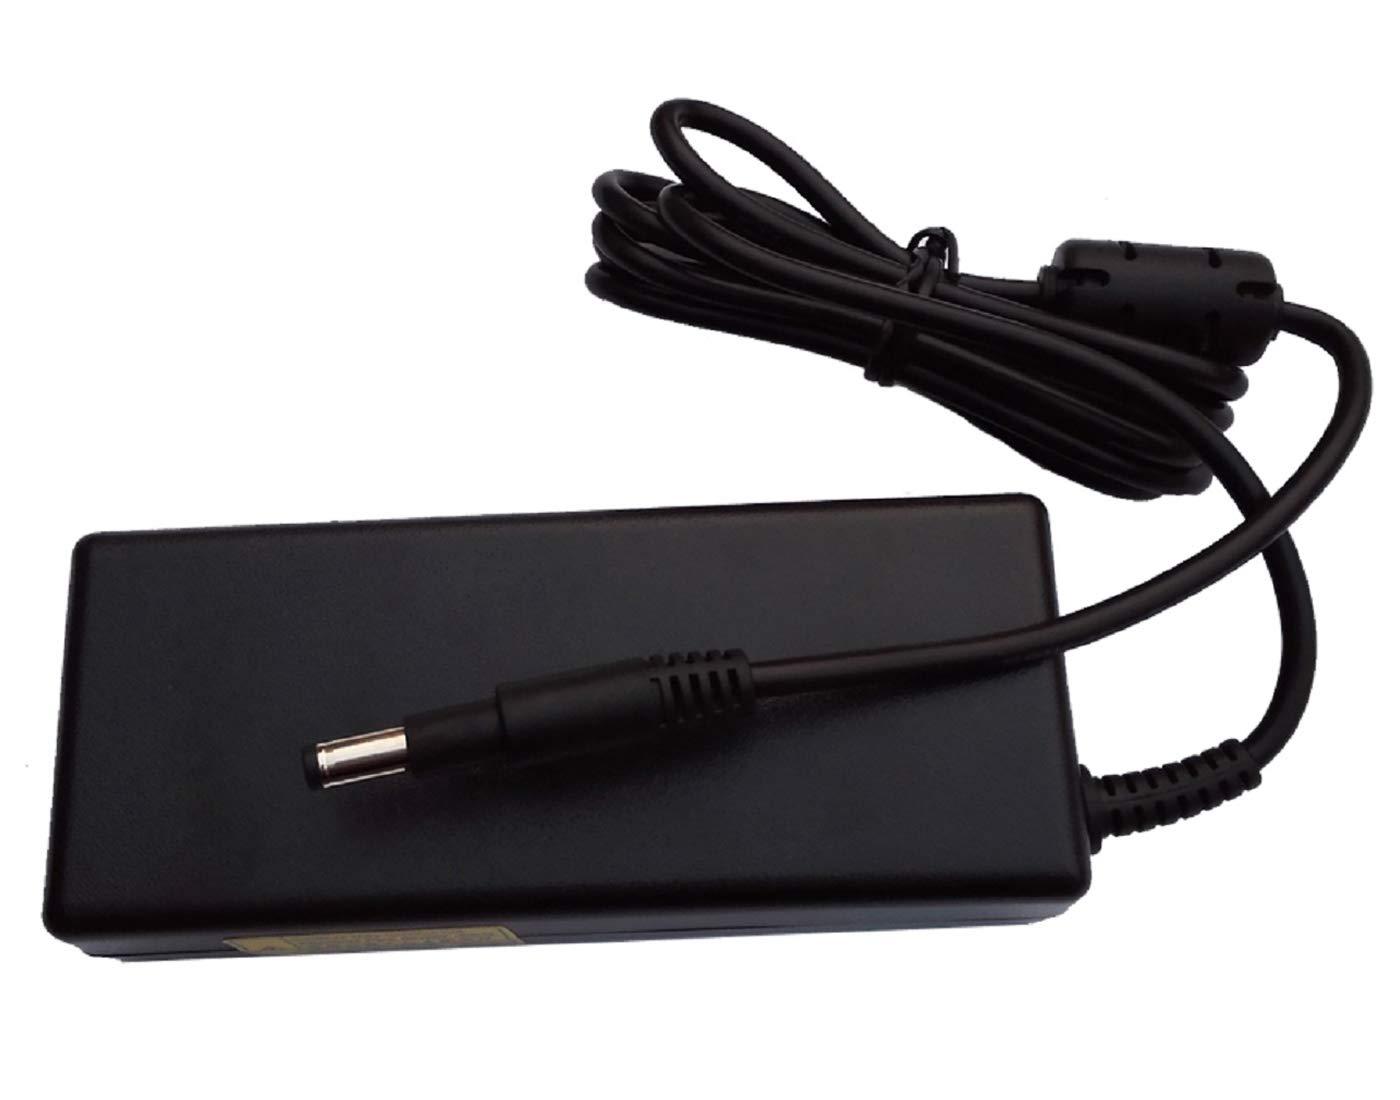 Amazon.com: Ac Adapter Laptop Charger for HP Pavilion TouchSmart 14-B109 14-B109WM E0X70UA Sleekbook HP Pavilion 15-B143, 15-B143CL, D1D69UA Sleekbook HP ...